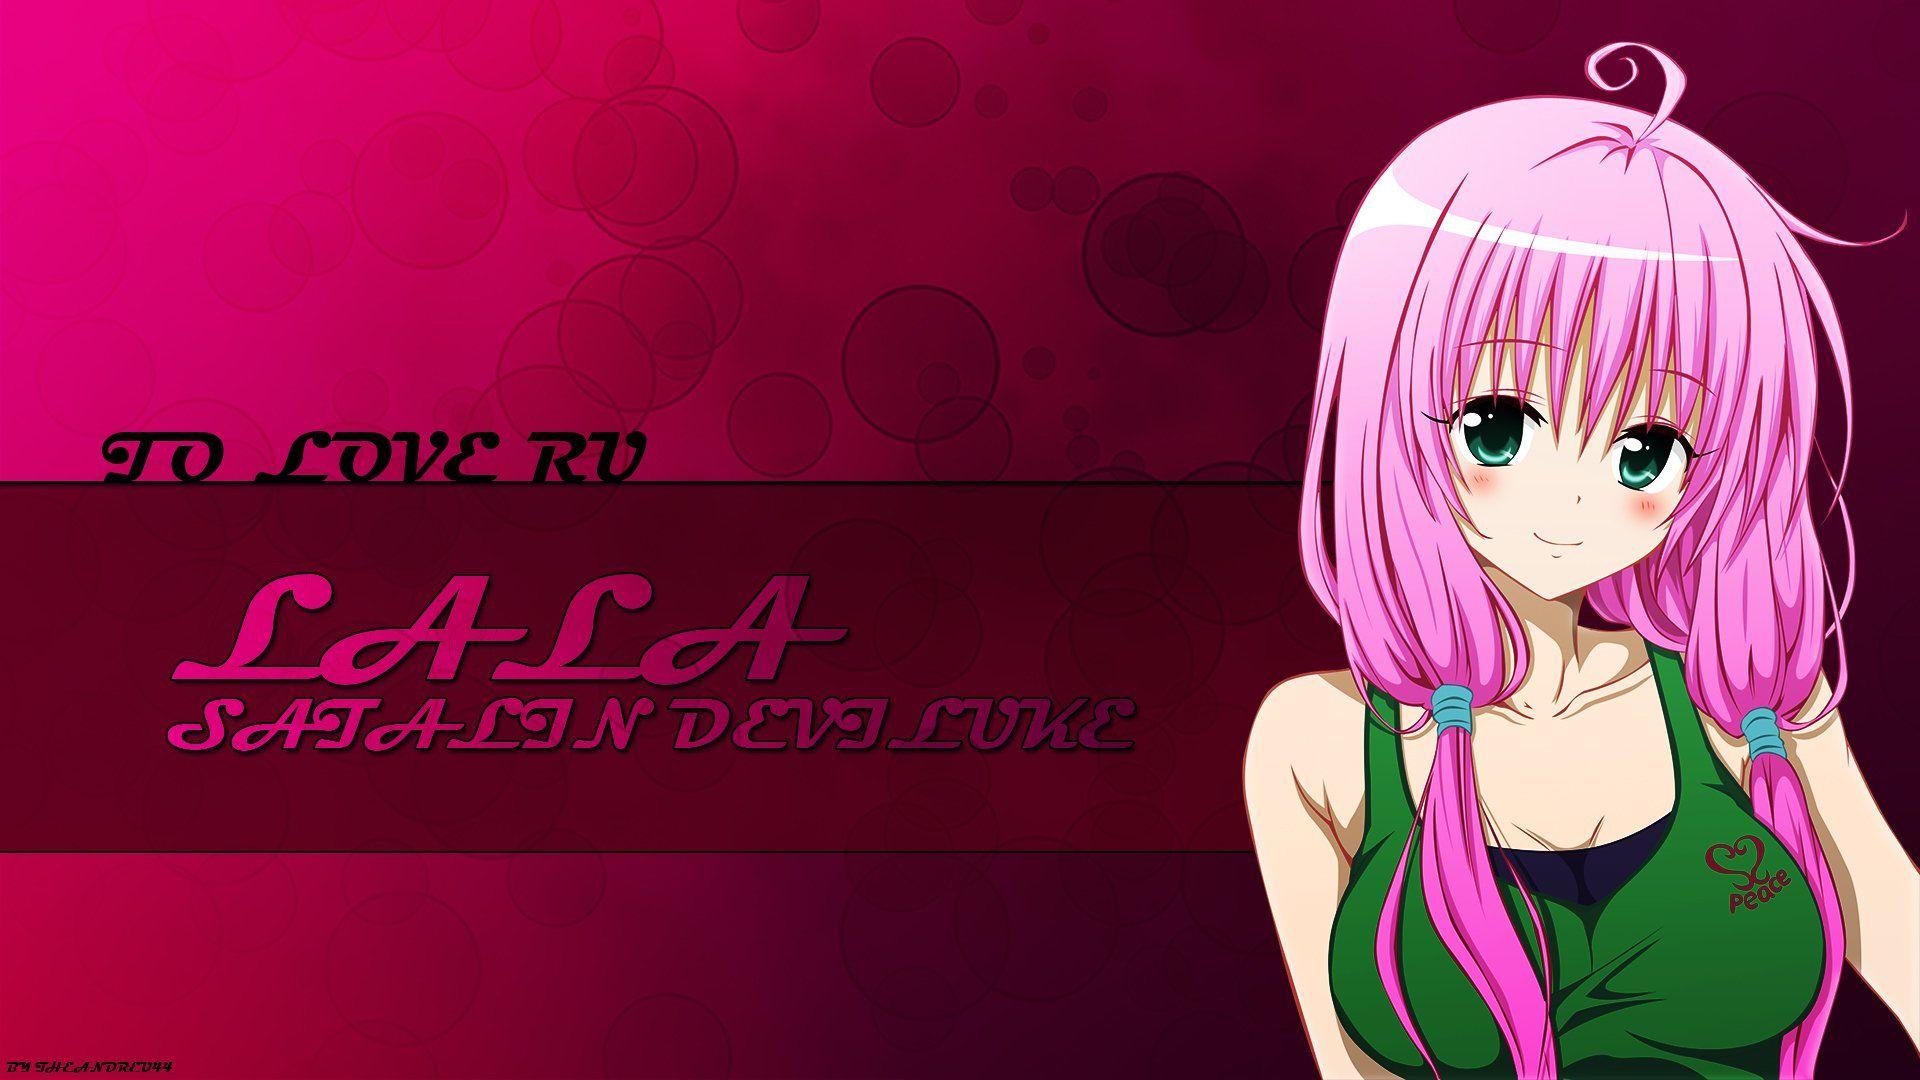 Lala Satalin Deviluke To Love Ru Anime Character Wallpaper